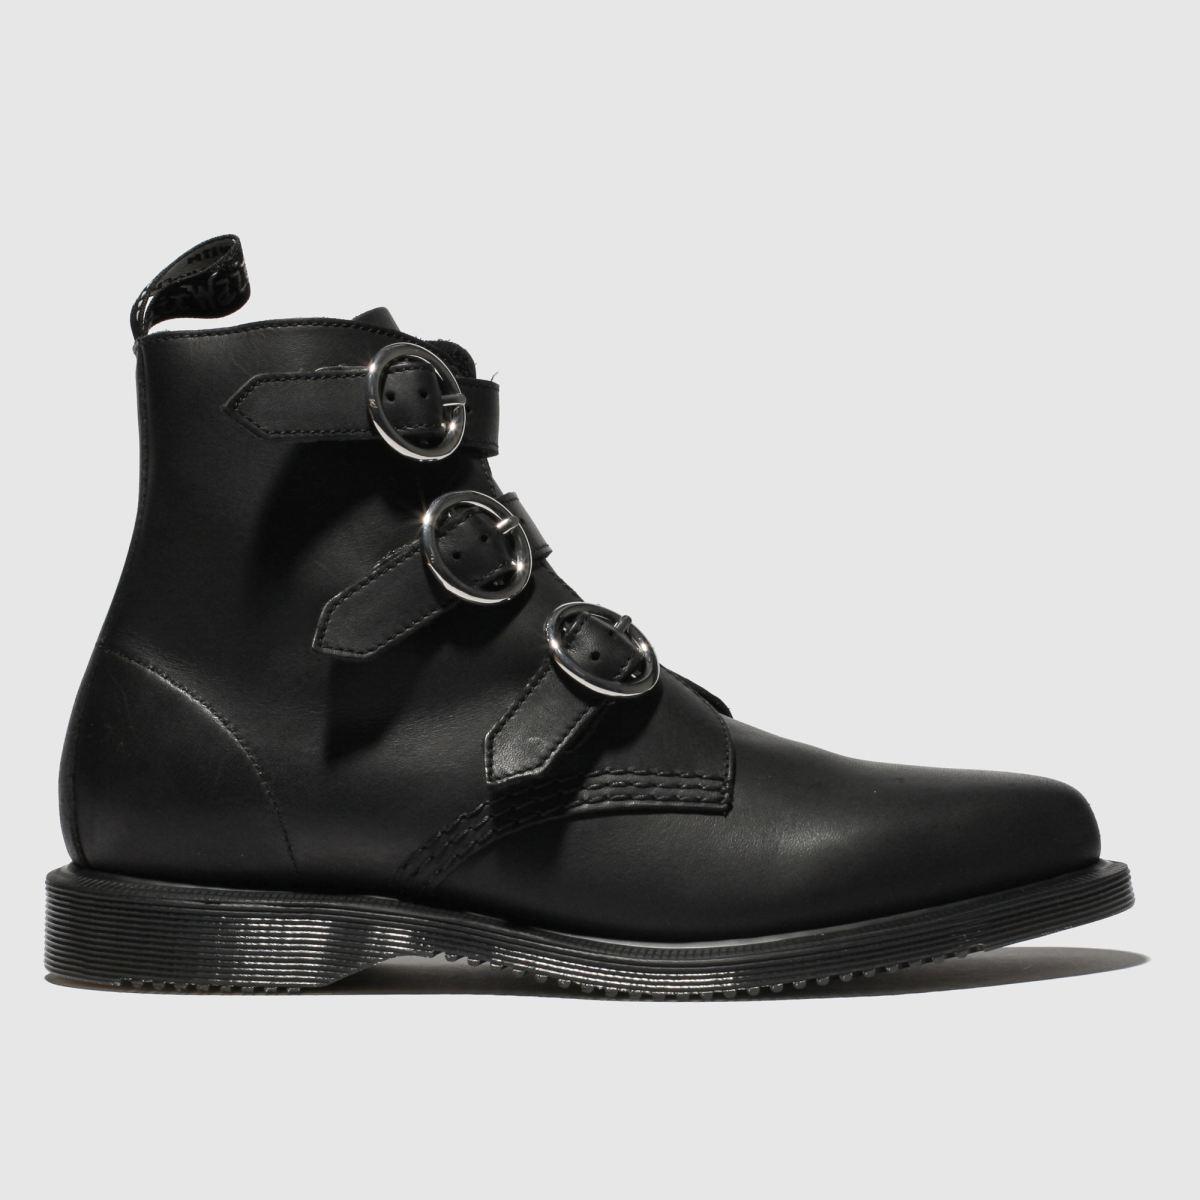 Dr Martens Black Maudie Boots